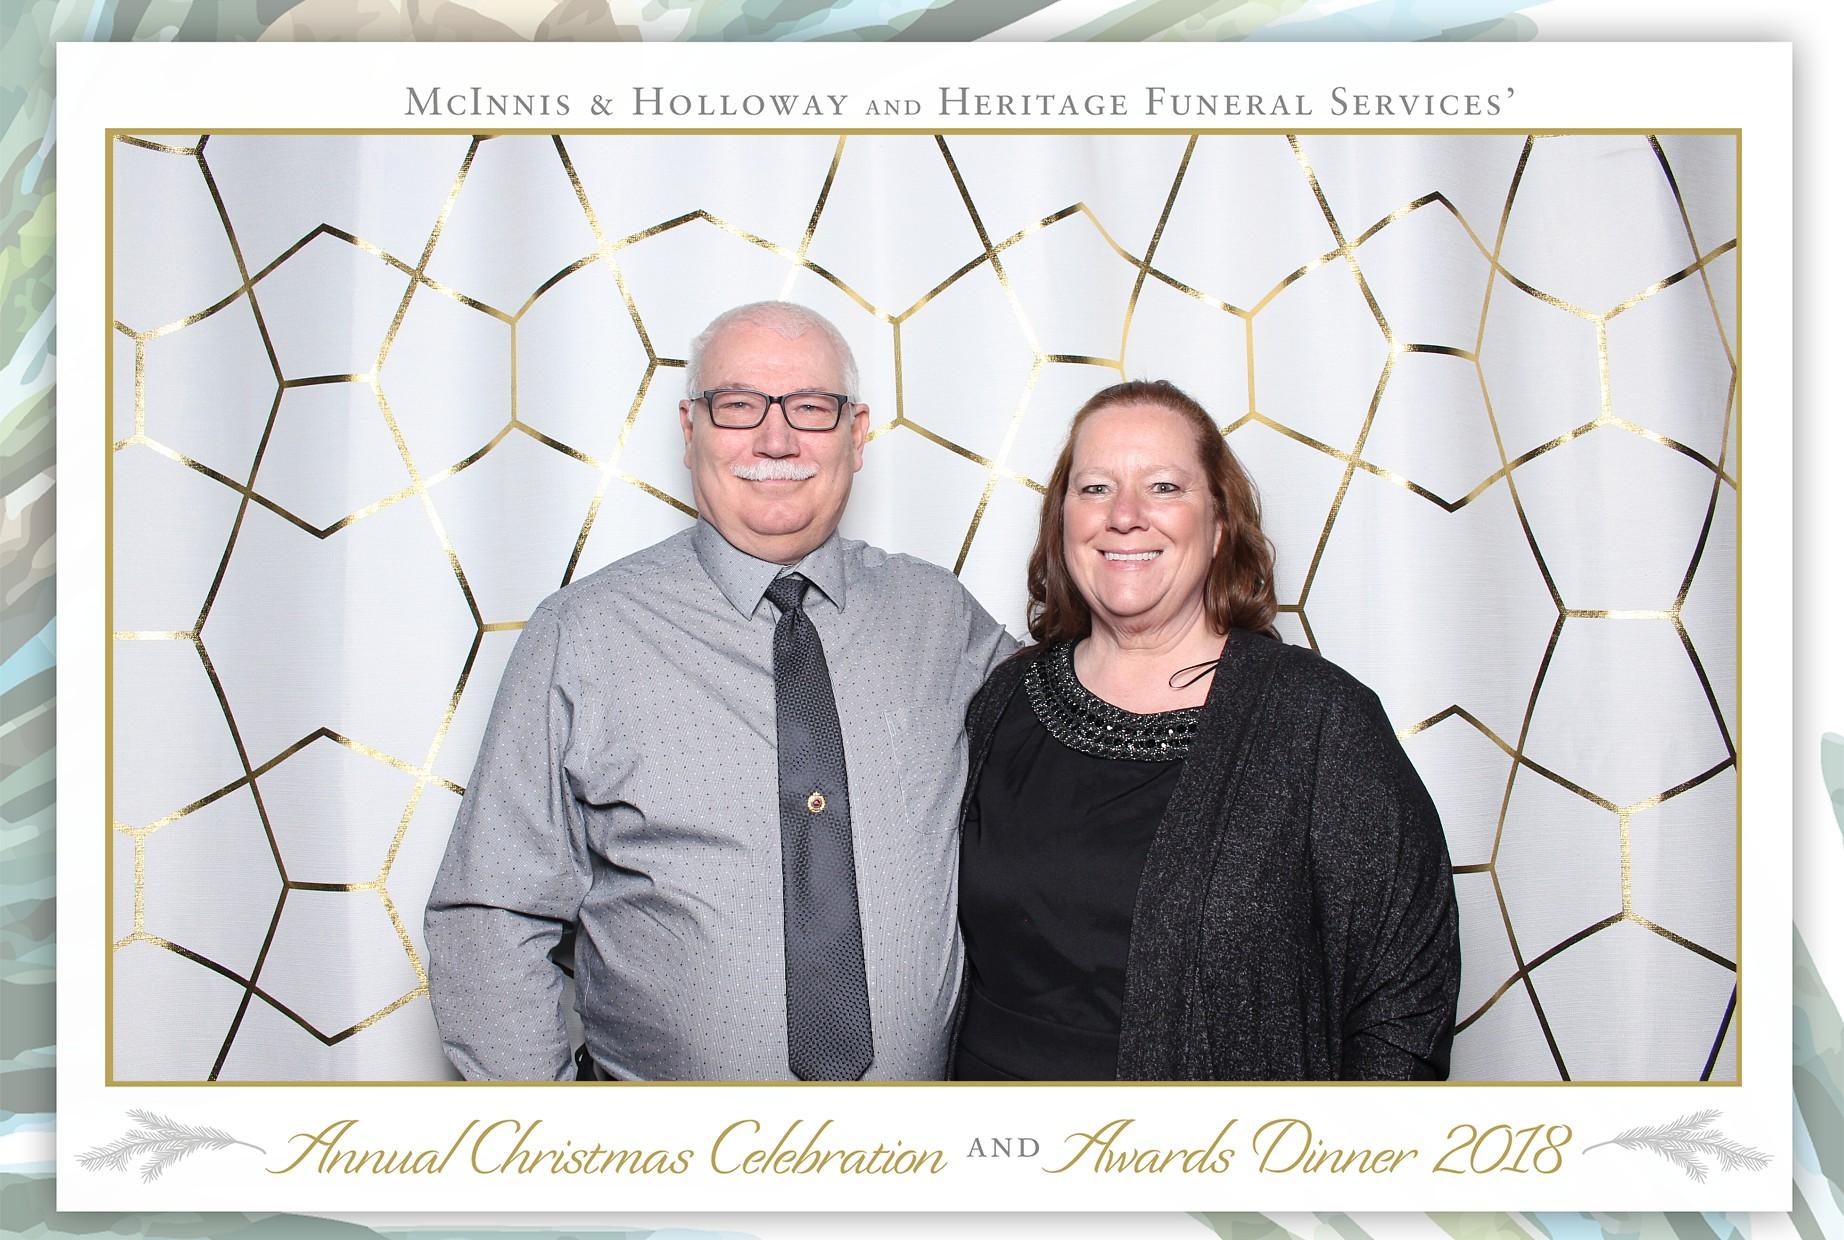 McInnisHolloway2018-0046-PRINT